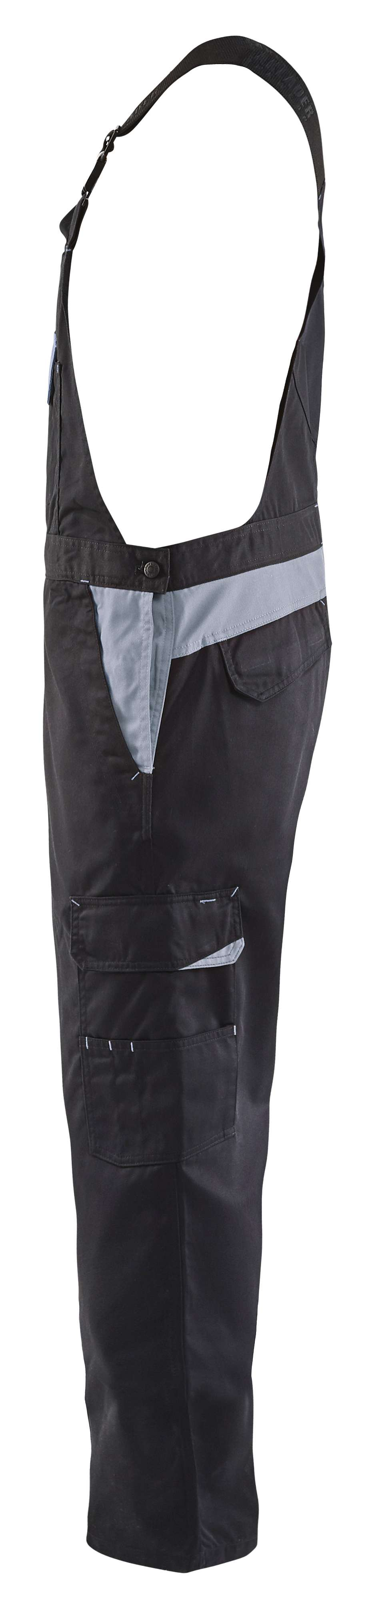 Blaklader Amerikaanse overalls 26641800 zwart-grijs(9994)